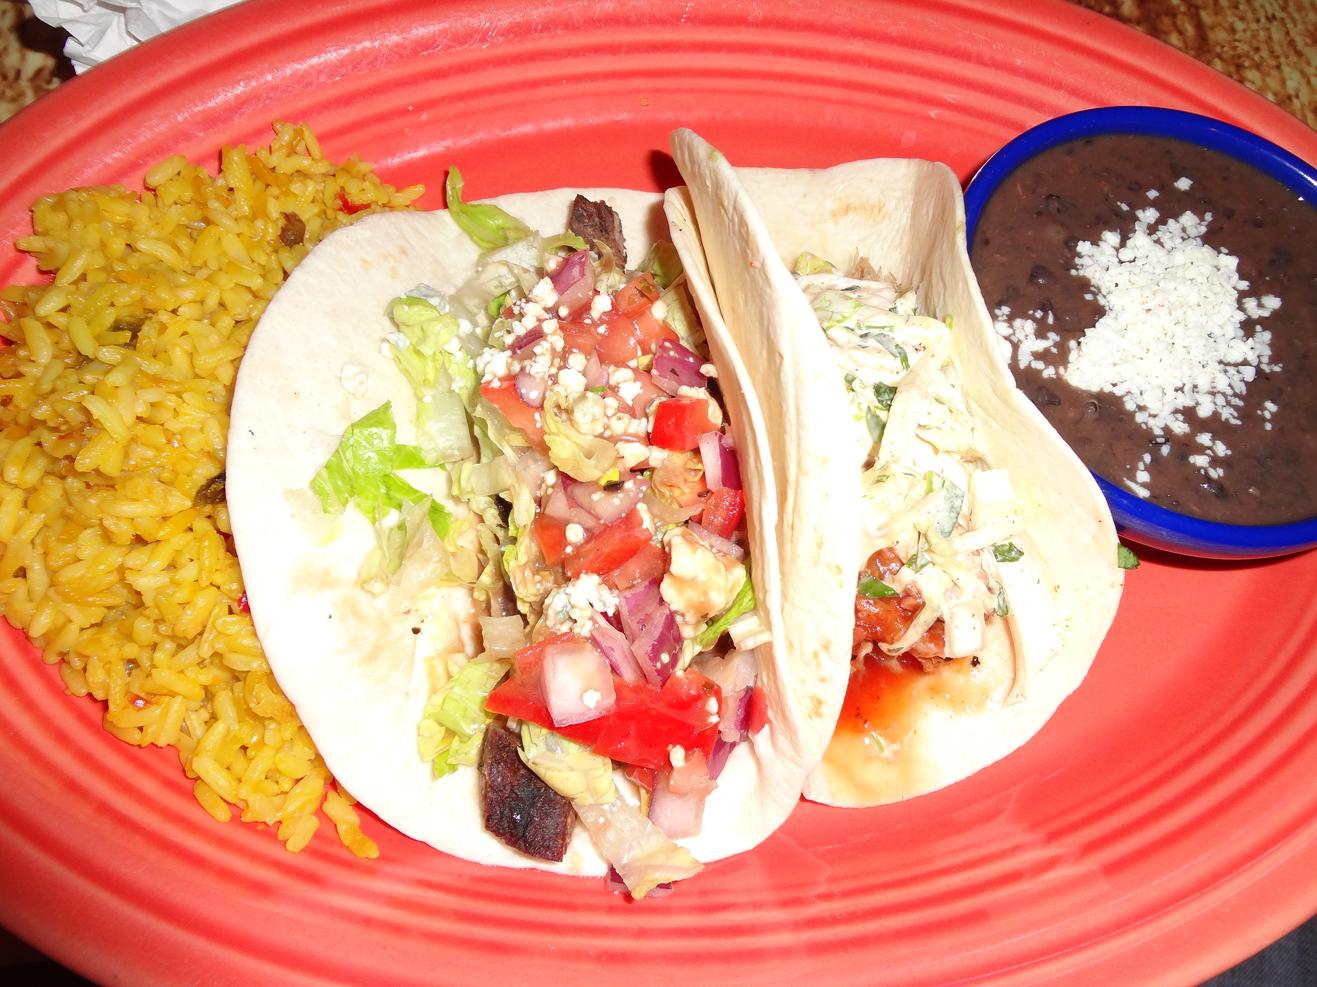 Twisted Taco 2-taco combo: Black & Bleu and Pulled Pork